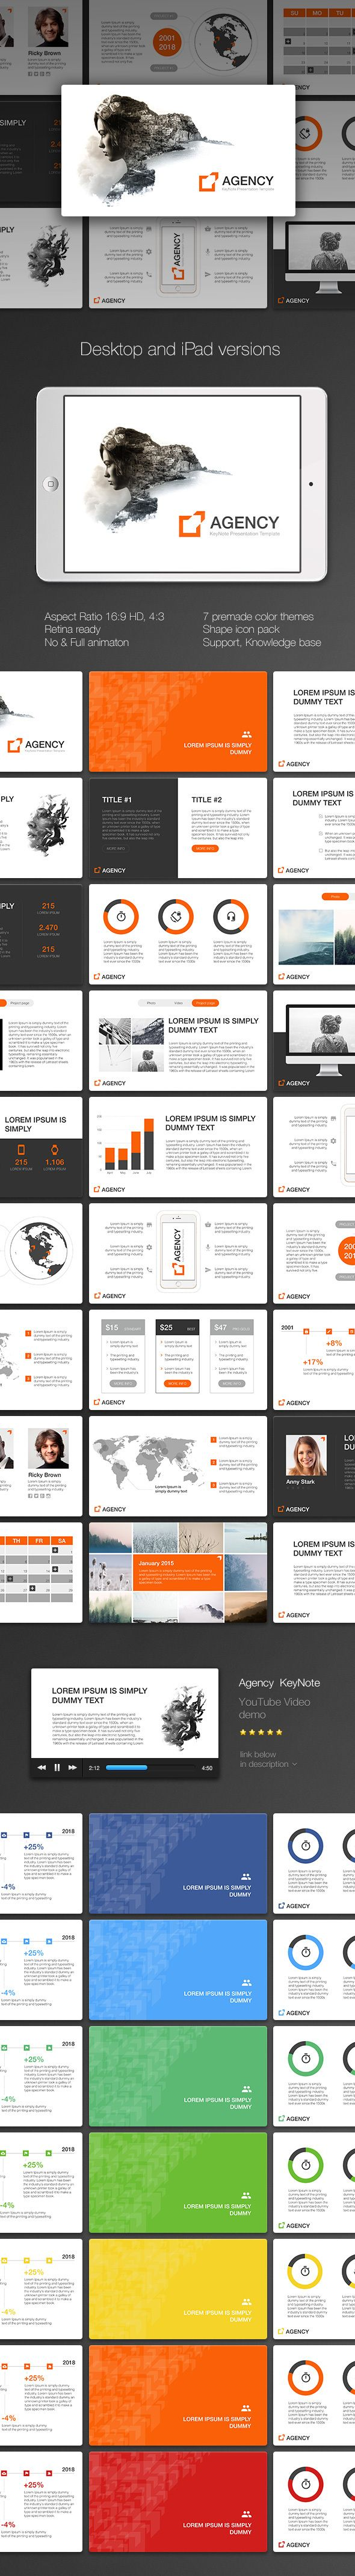 Agency KeyNote Template #slides Download here: http://graphicriver.net/item/agency-keynote/14577819?ref=ksioks